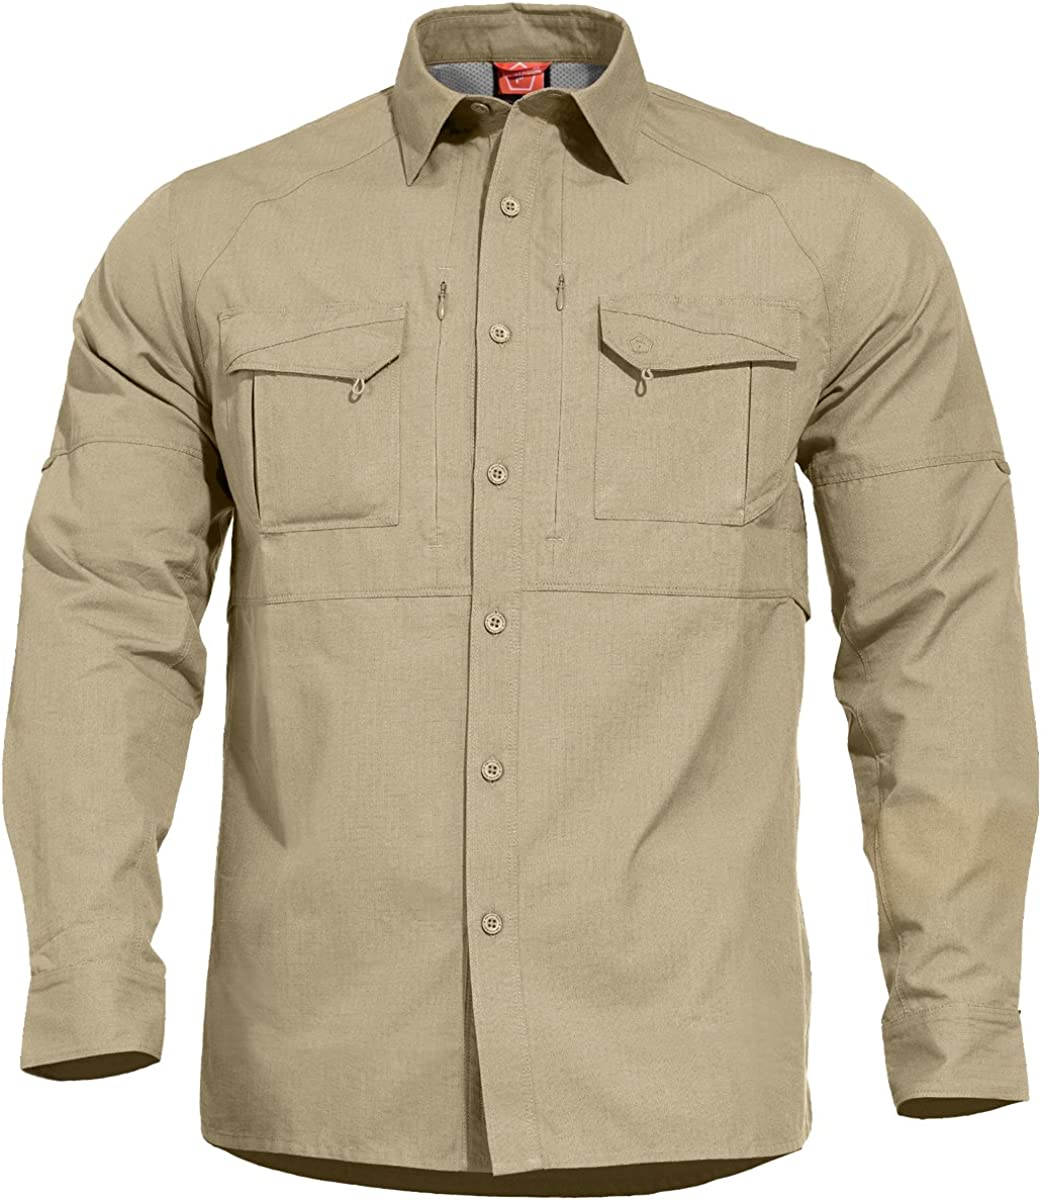 PENTAGON Chase Tactical Shirt, Size-4xl, Colour Camisa, Marrón (Khaki 04), XXXX-Large para Hombre: Amazon.es: Ropa y accesorios